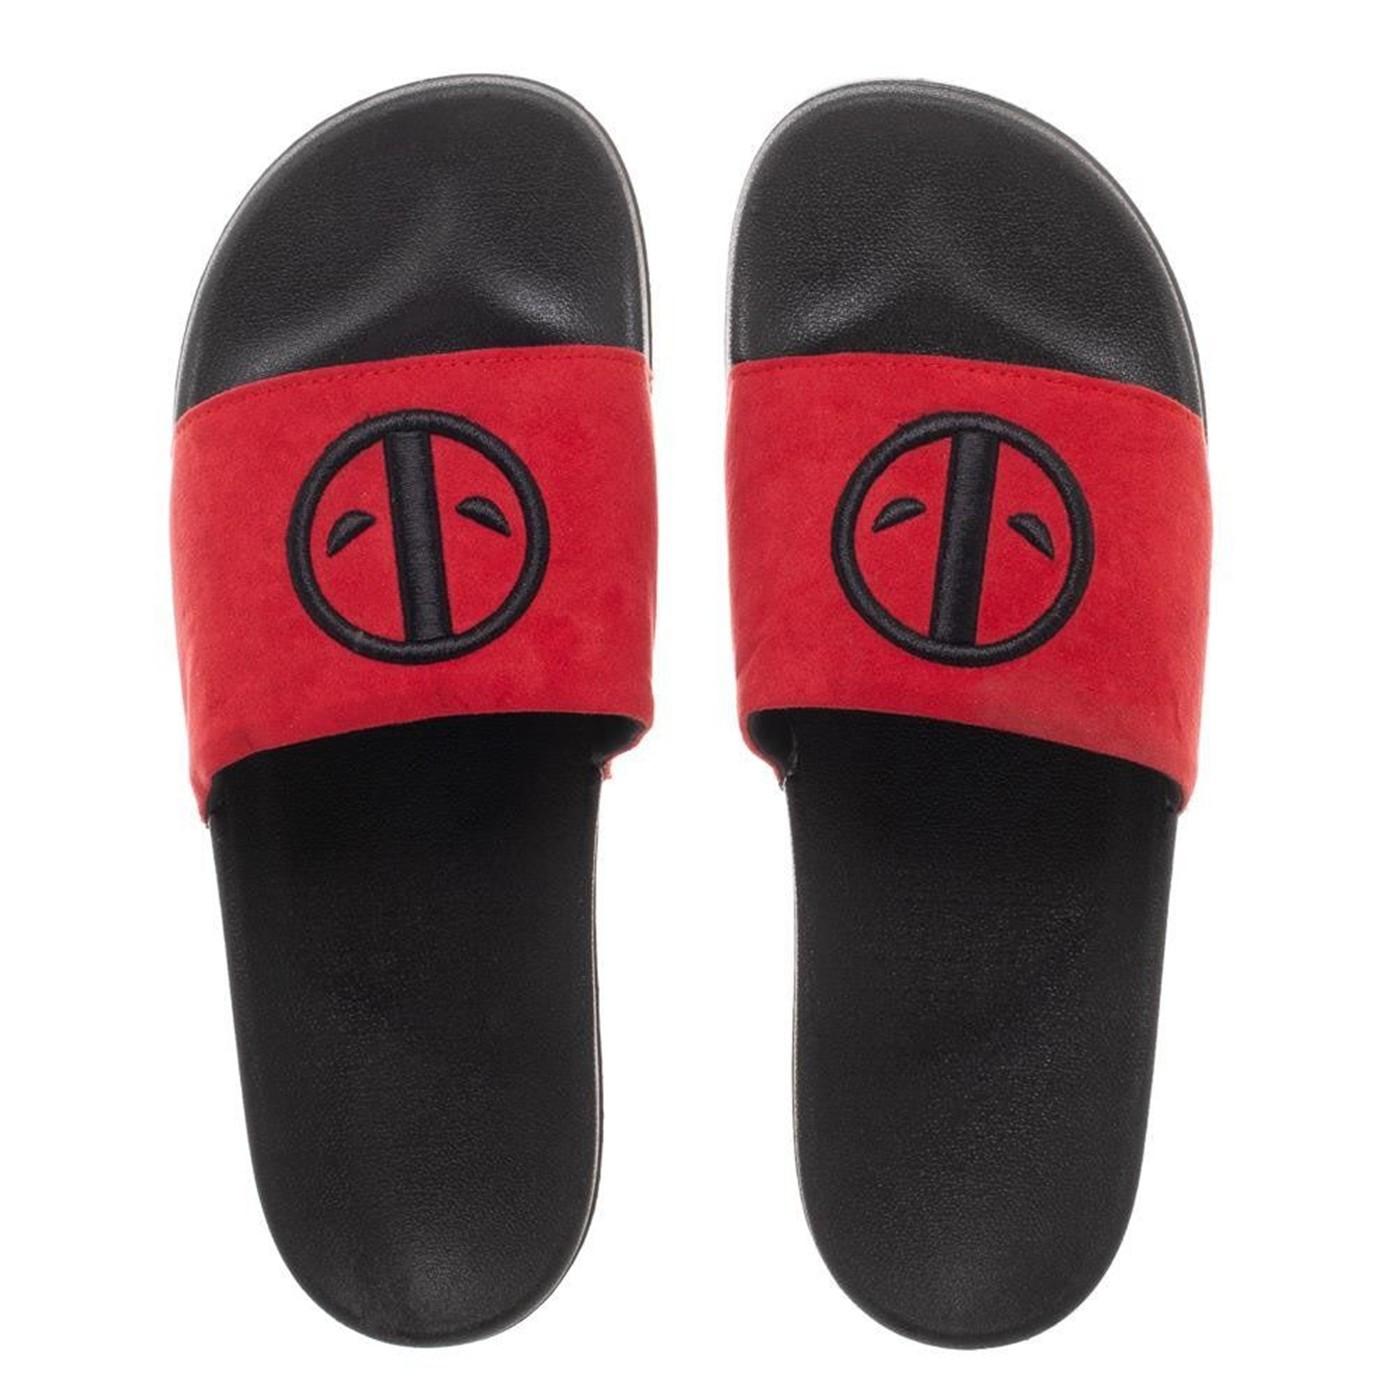 Deadpool Vegan Suede Slide Sandals